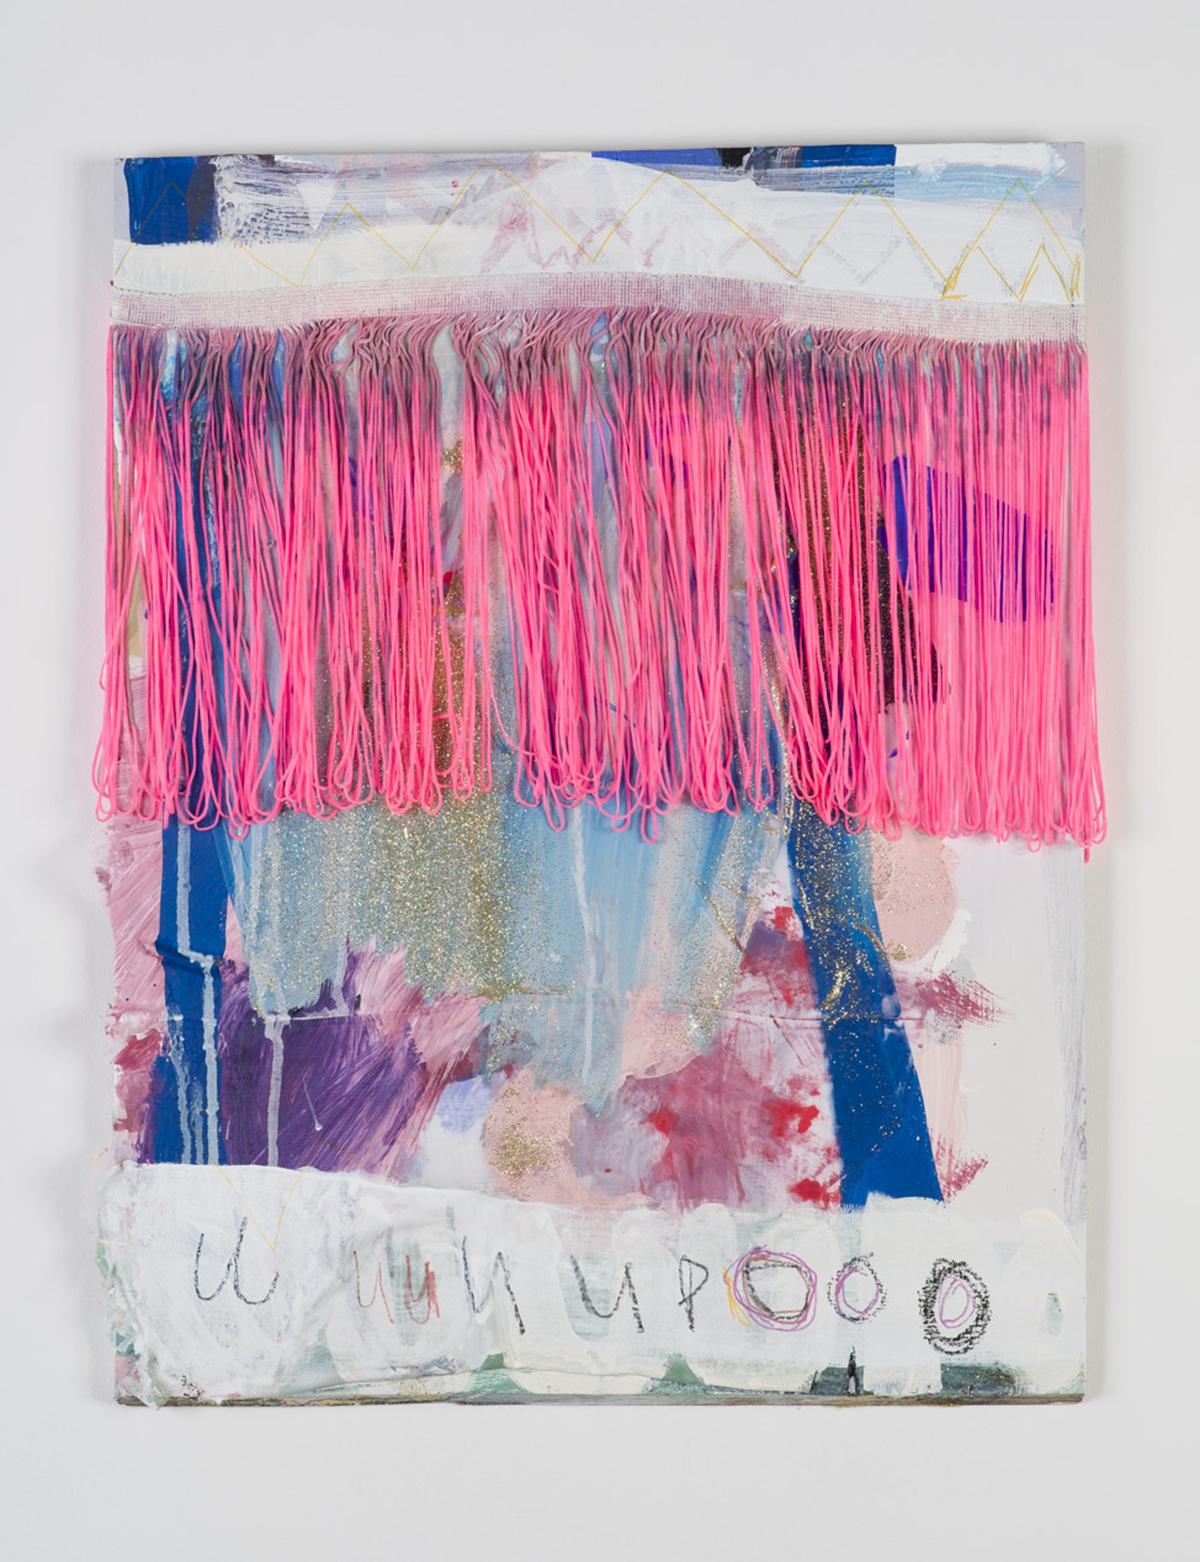 UUUUPPPOOOO PAINT , 2017 textile on board 50cm X 65cm